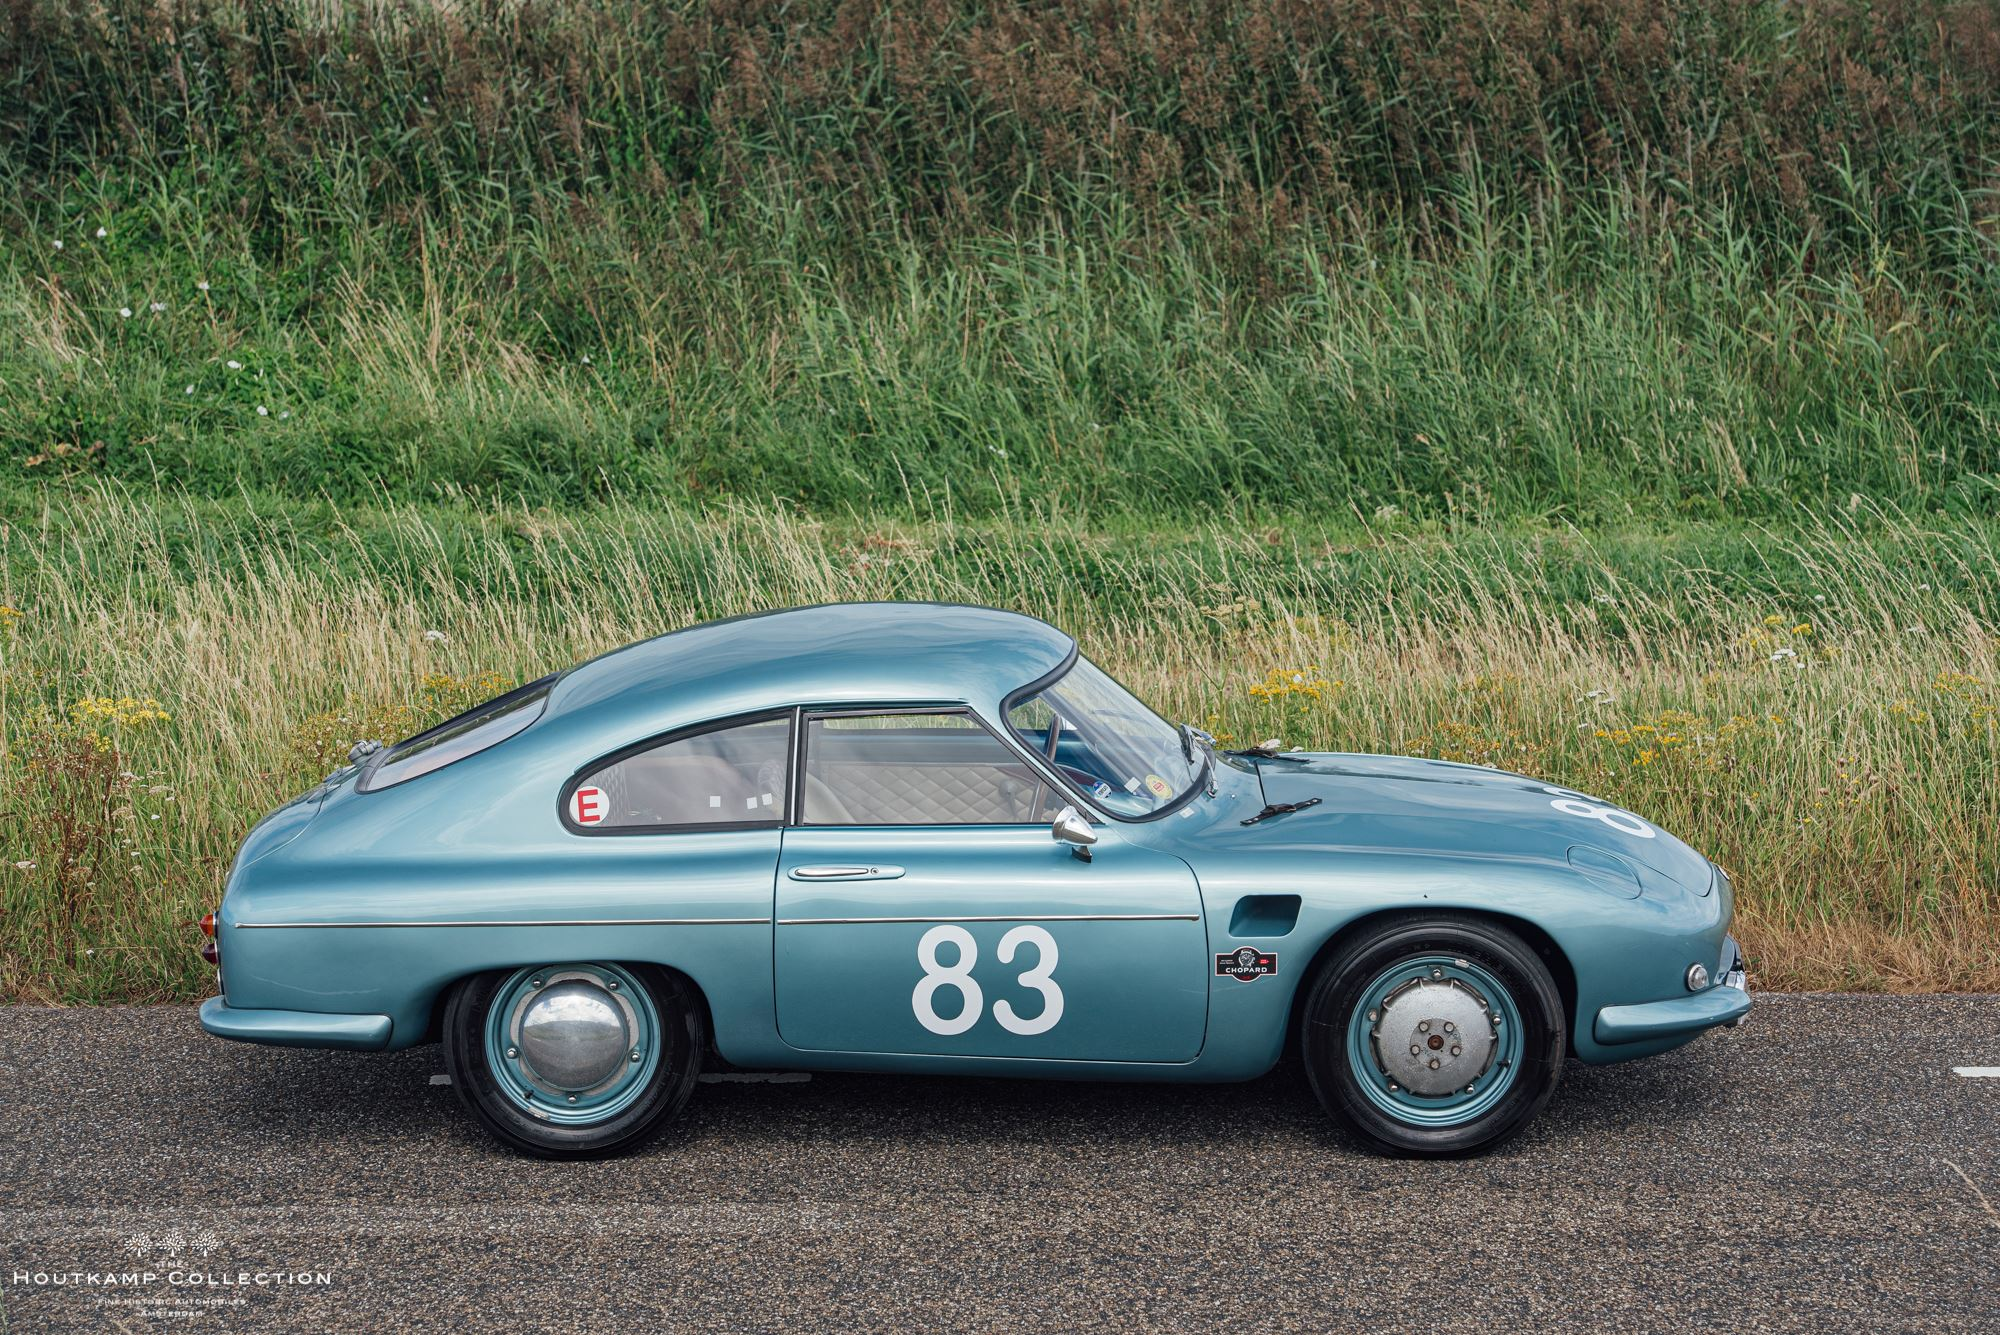 1956-DB-HBR-5-Race-car-Mille-Miglia-1957-(4)